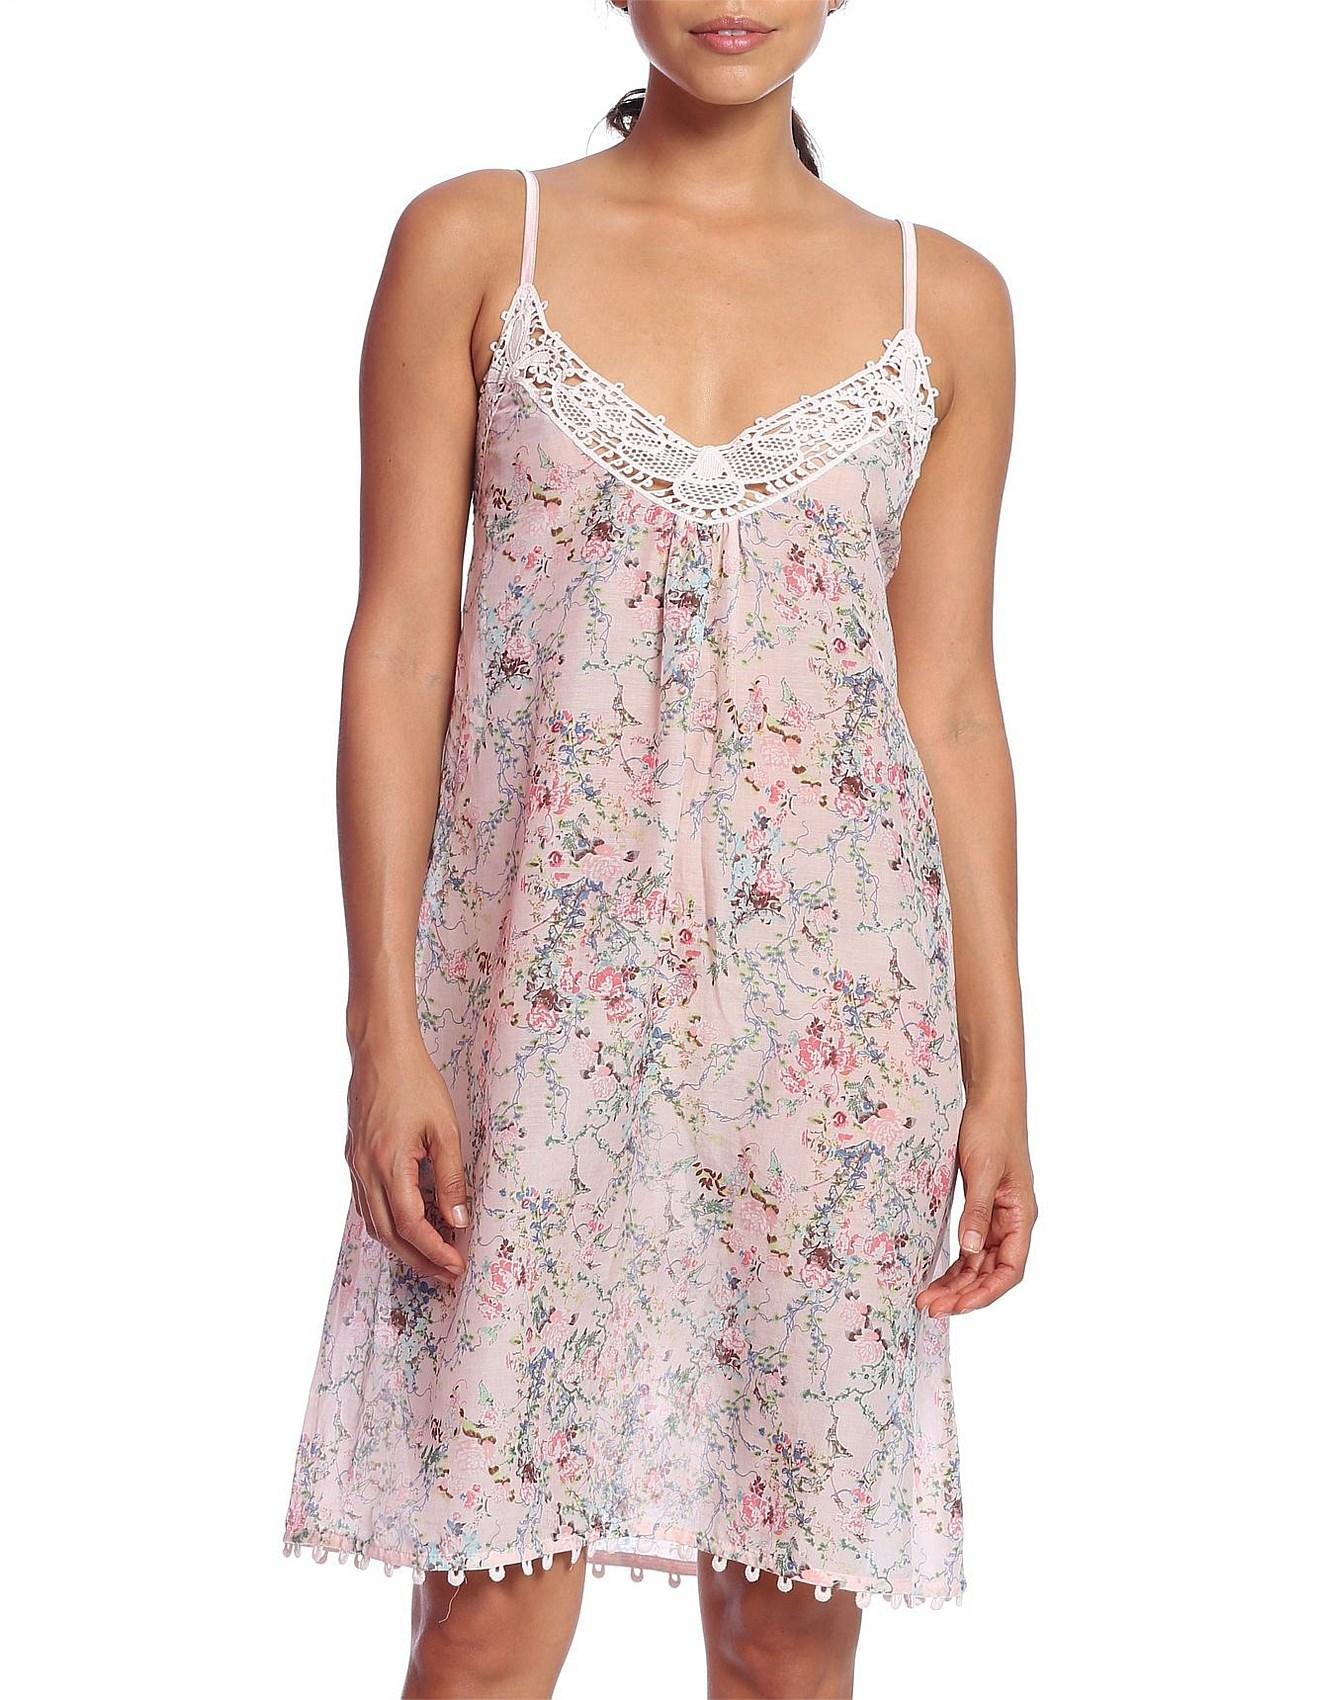 c2559b1024 Pyjamas   Sleepwear - Yolly Floral Lace Front Nightie